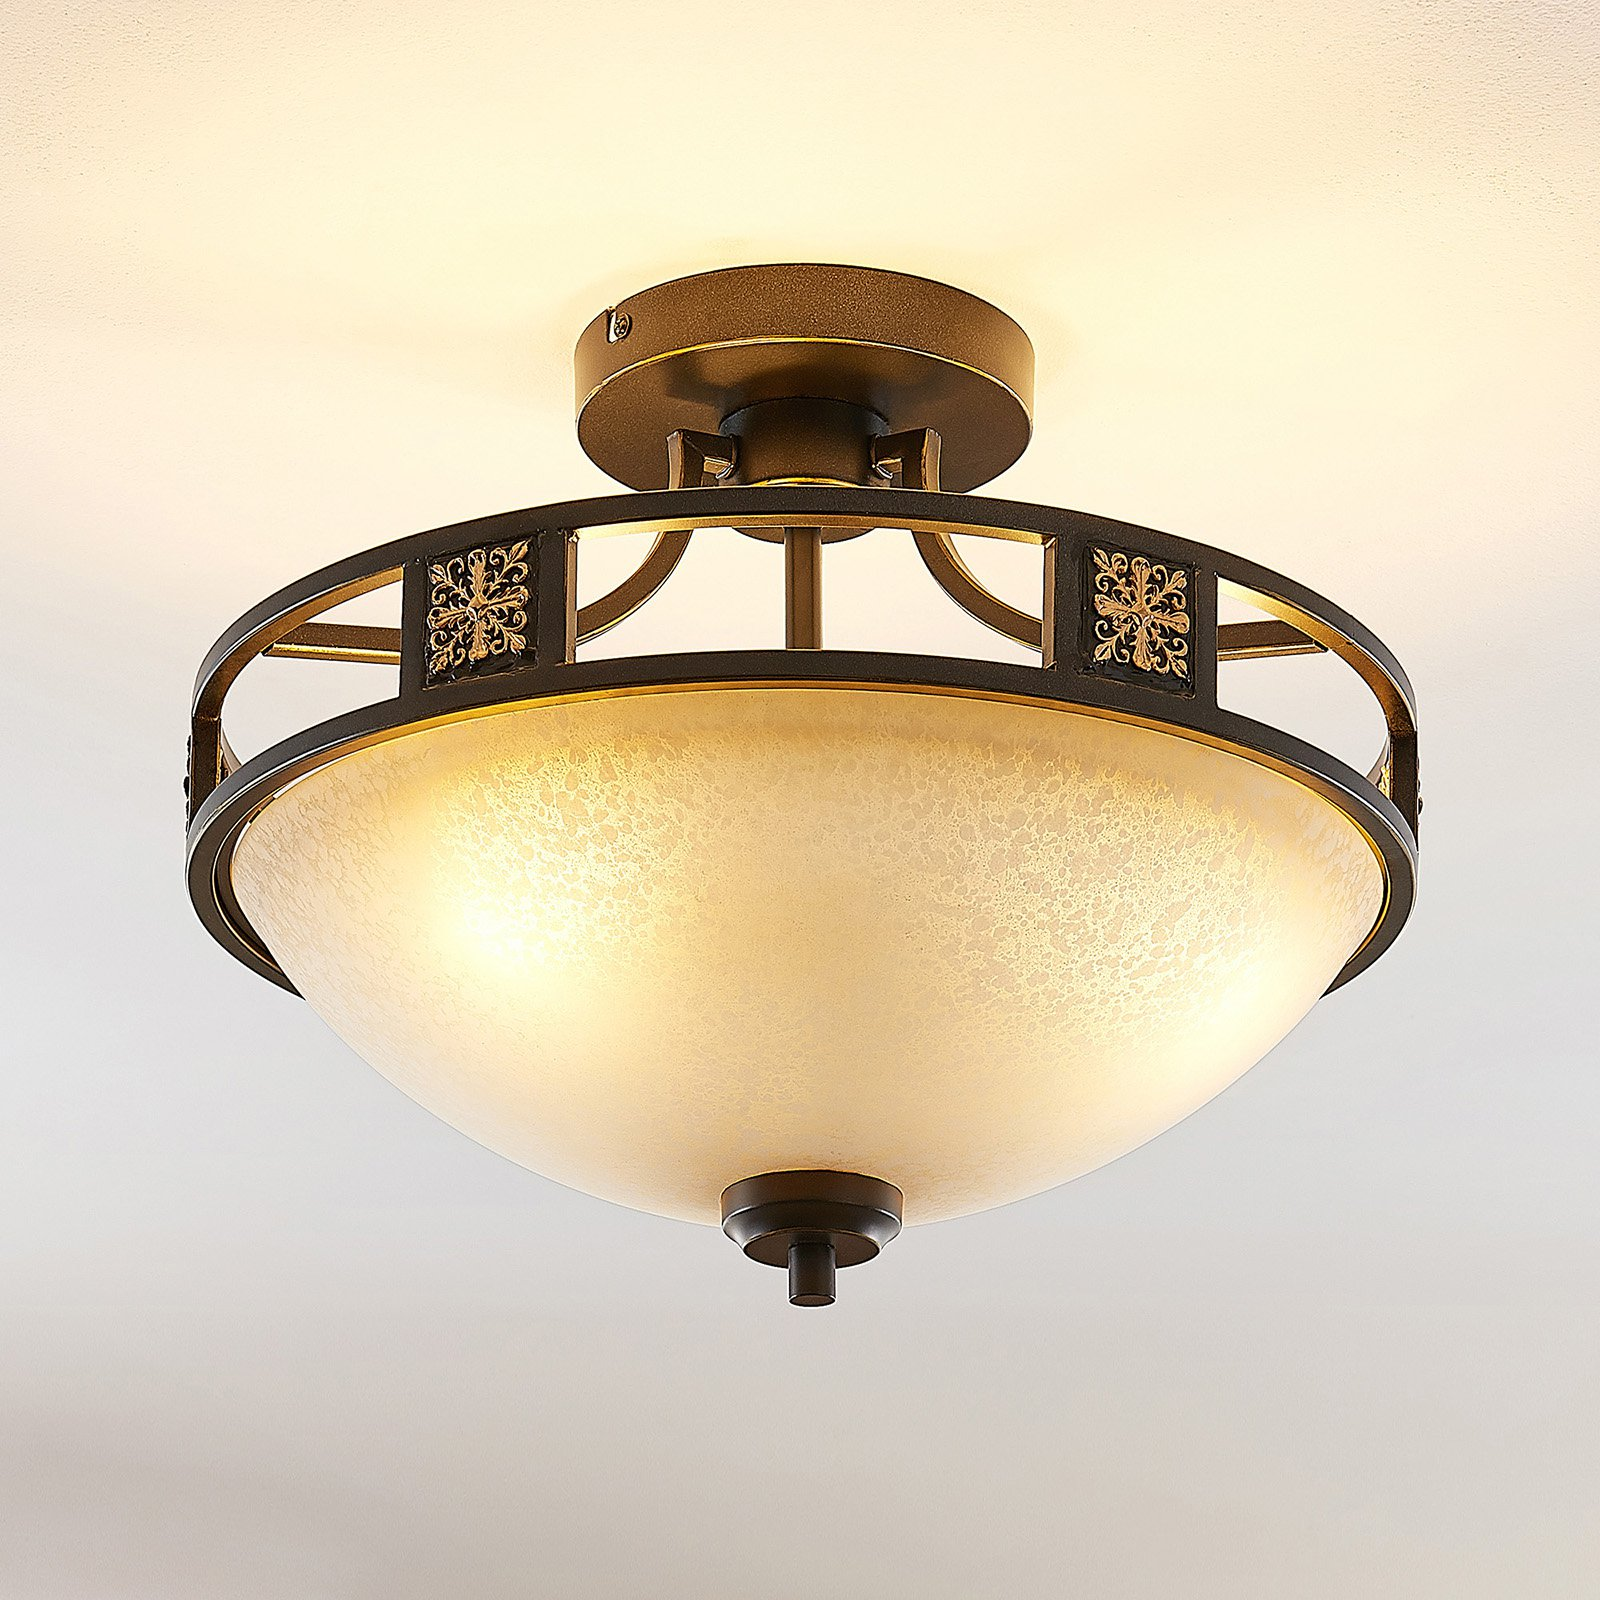 Lindby Ferre glass-taklampe i rust-utseende